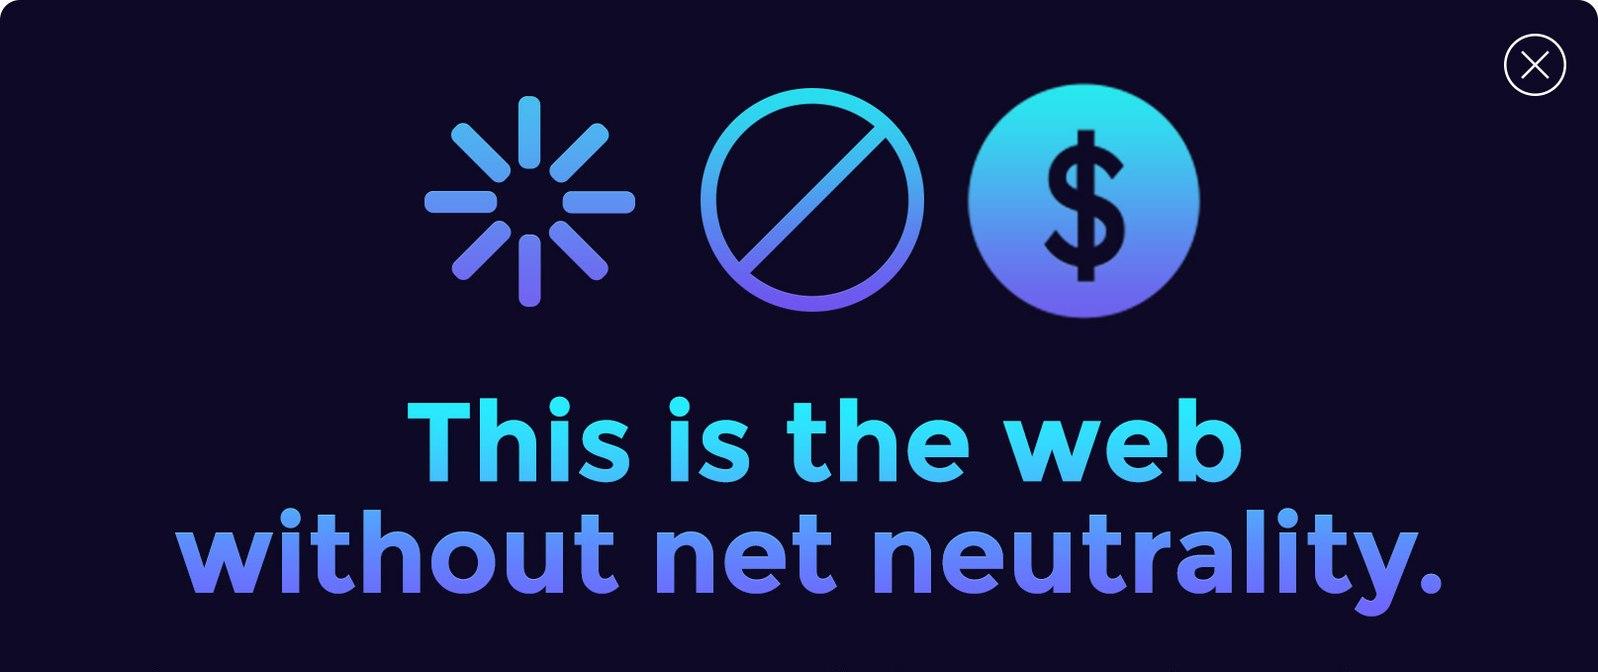 Opinion: Gen Z Won't Let #NetNeutrality Go Without a #Fight